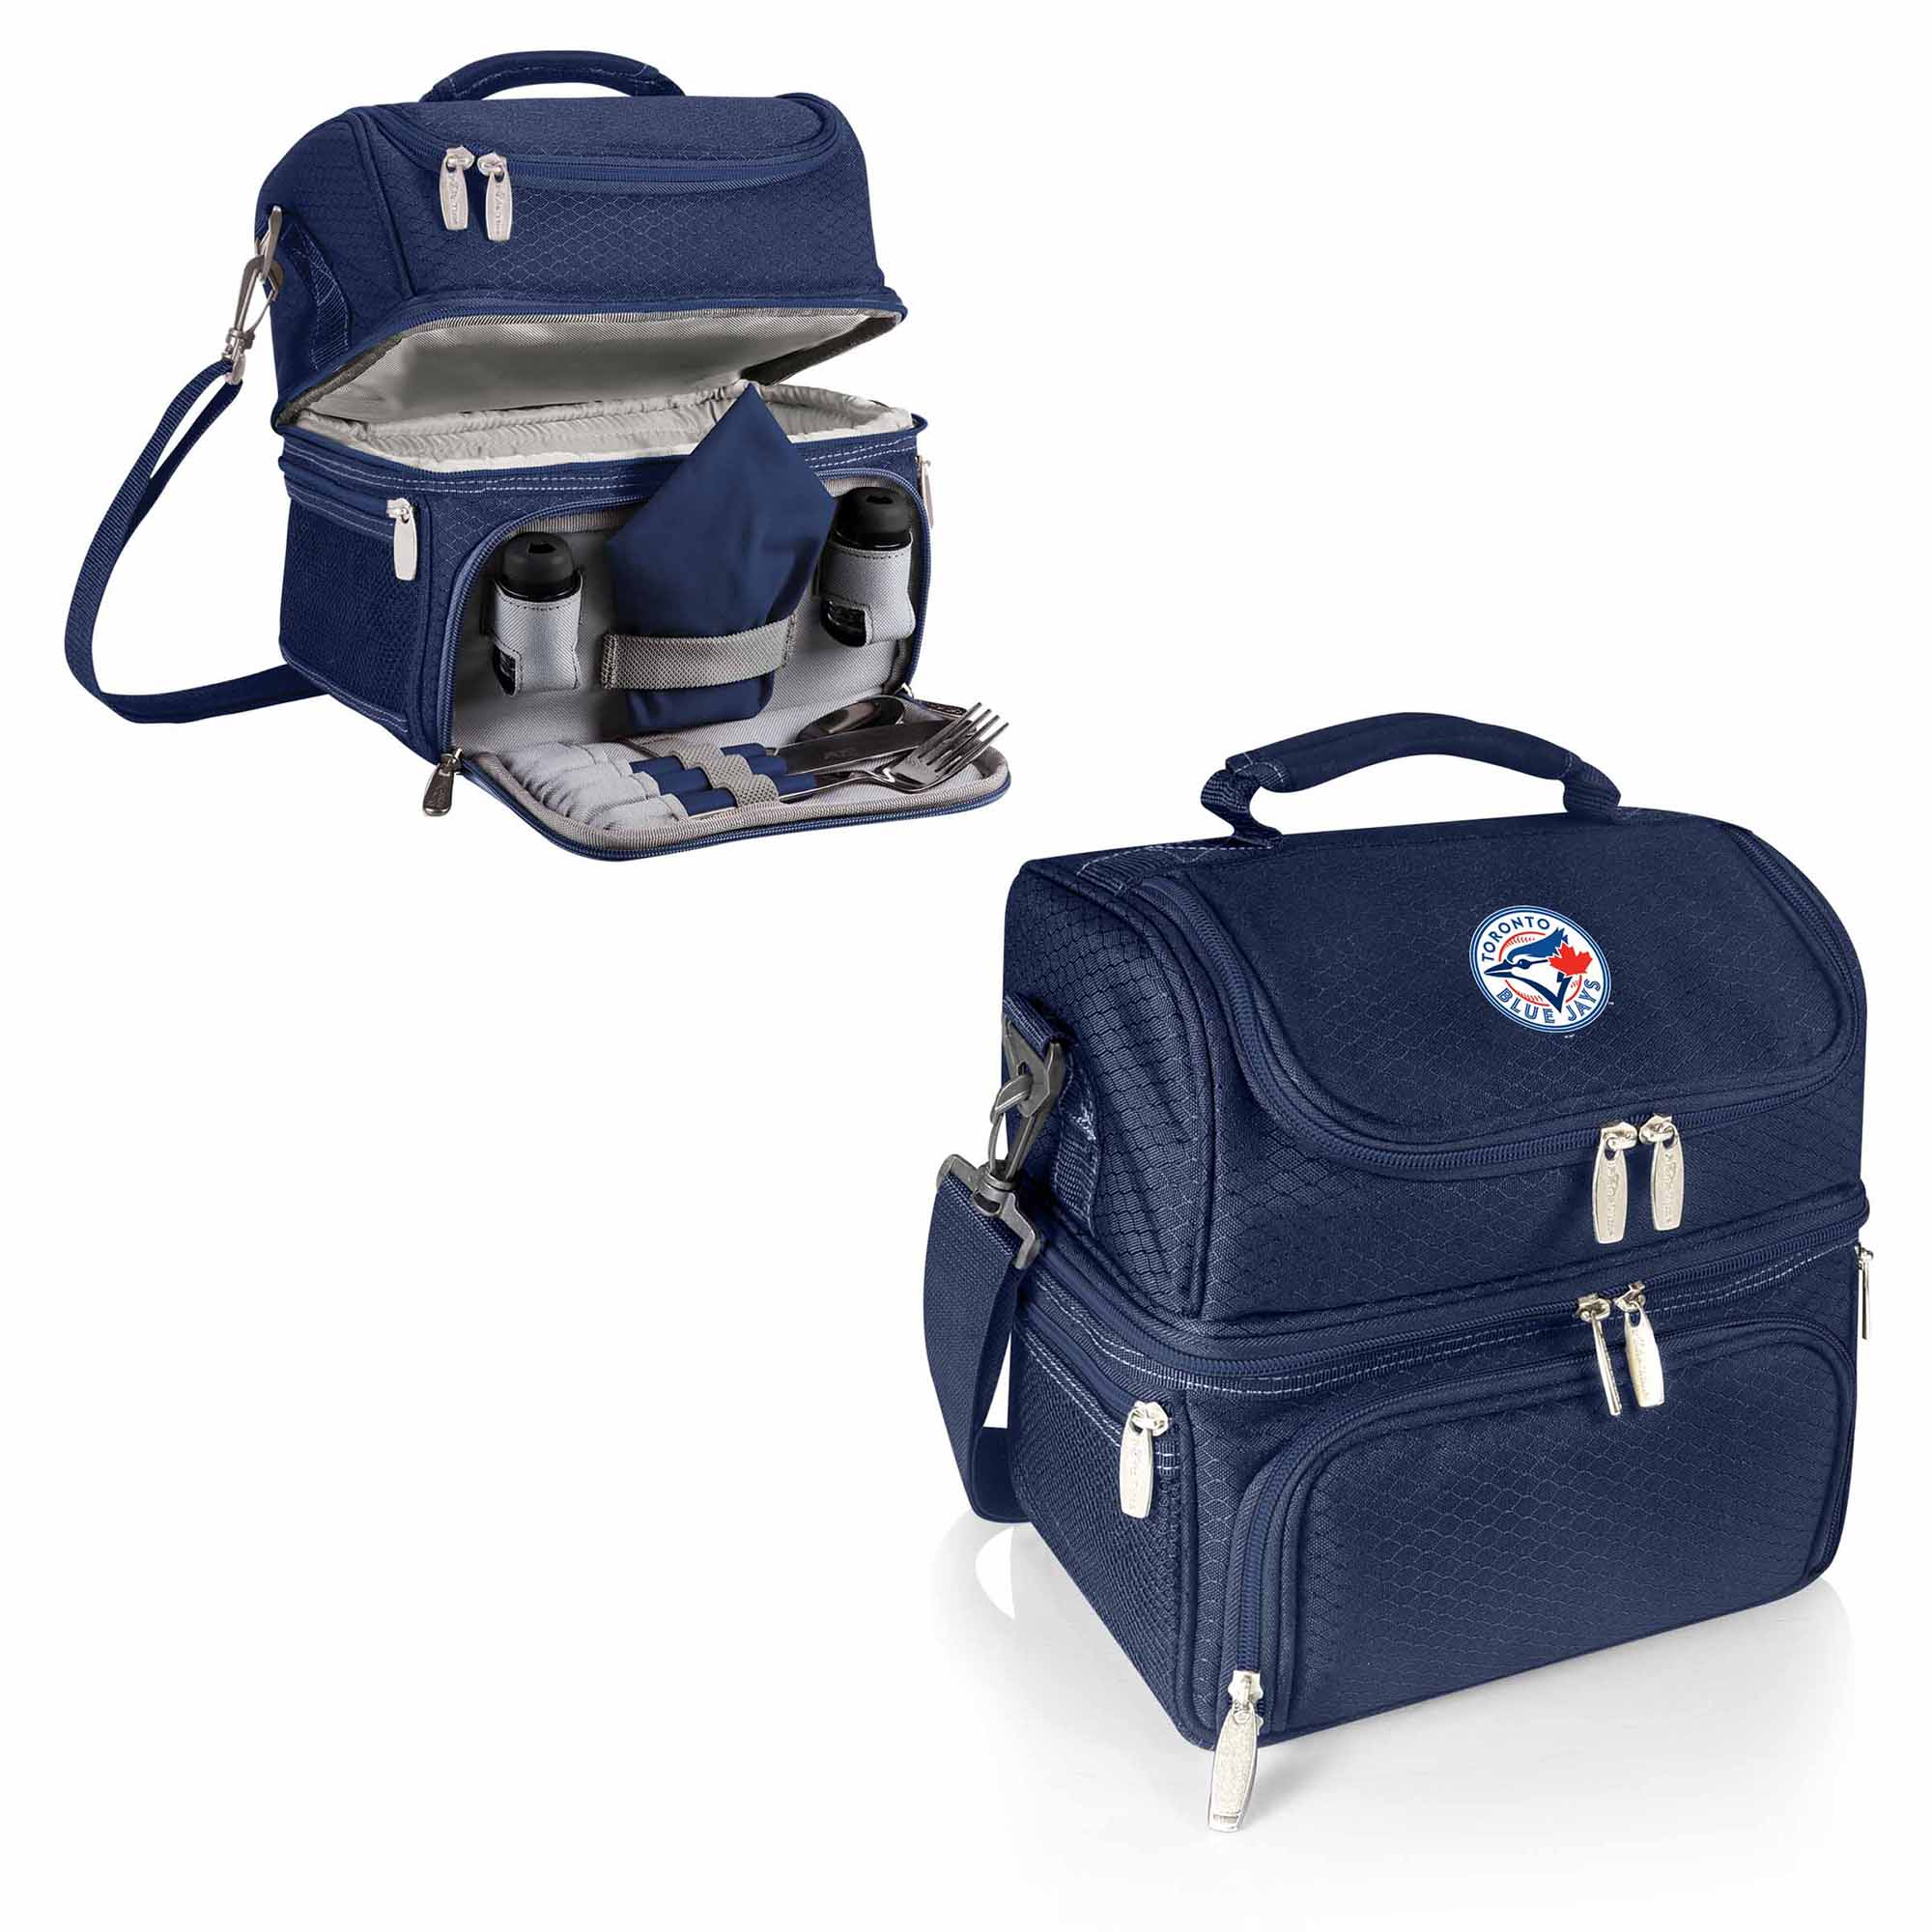 Toronto Blue Jays Pranzo Lunch Tote - Navy - No Size